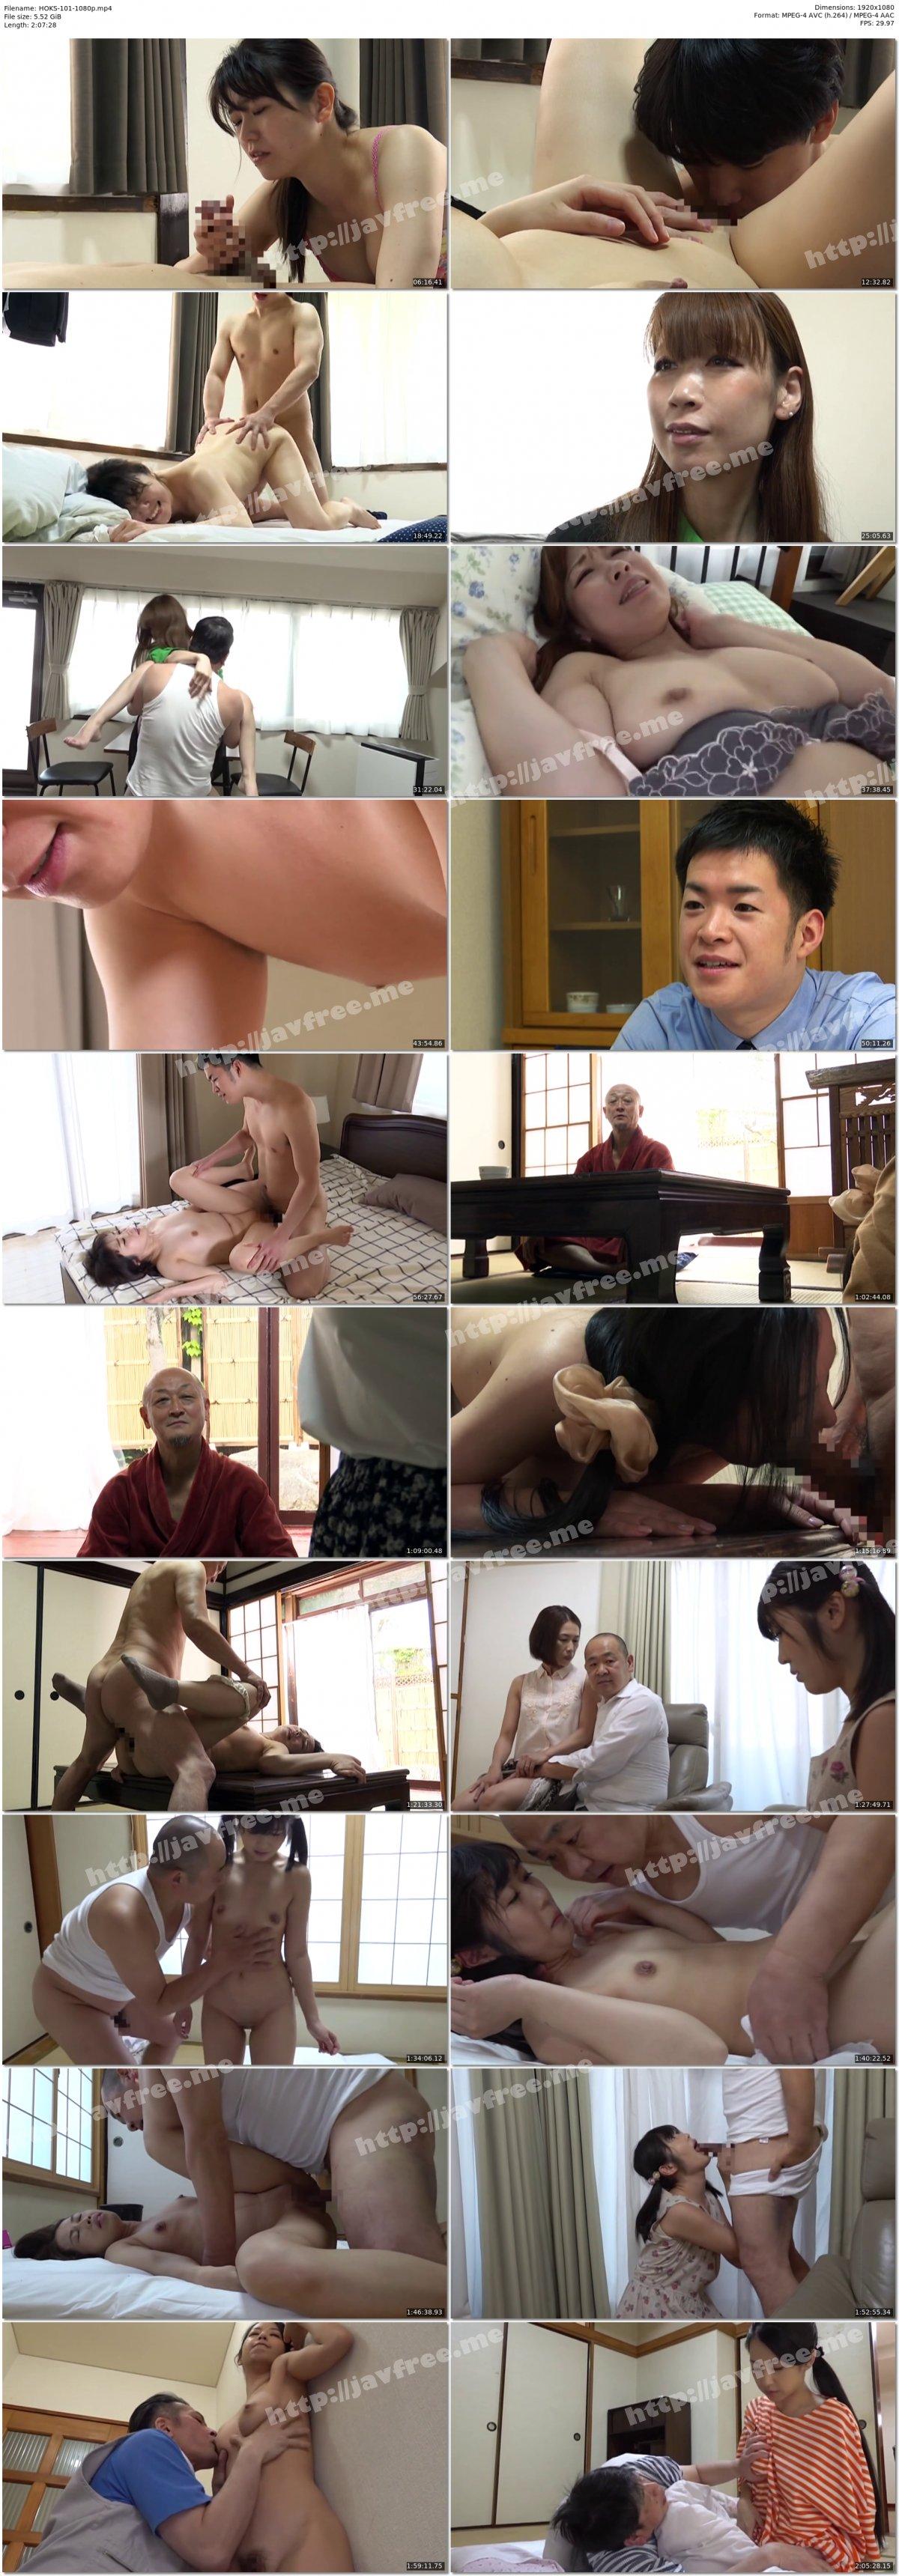 [HD][HOKS-101] 主婦売春 堕ちた四十路妻 - image HOKS-101-1080p on https://javfree.me